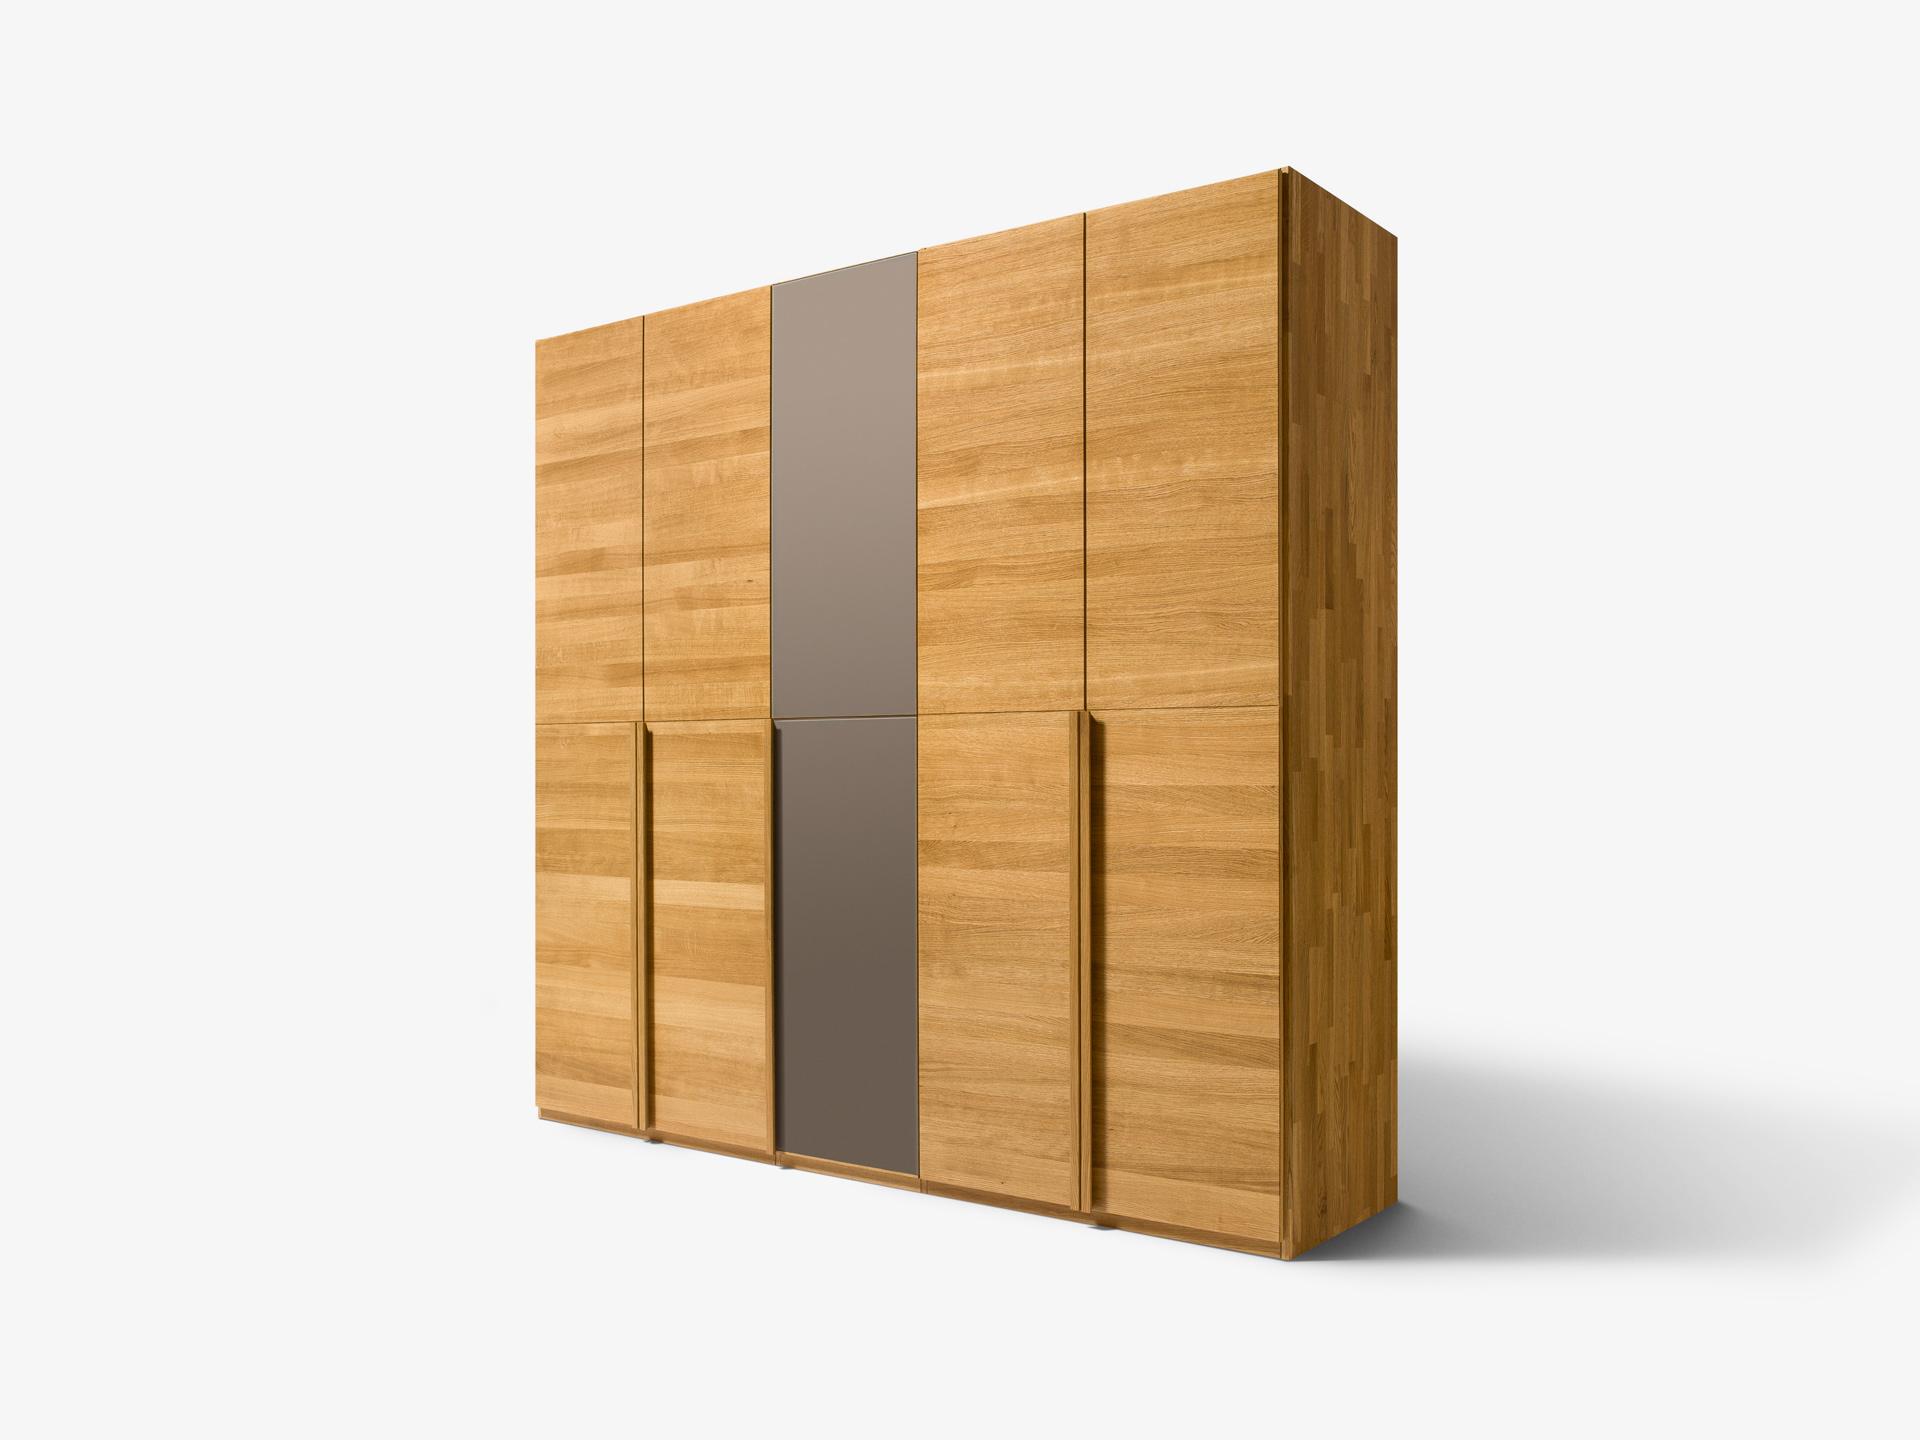 team 7 schrank wien. Black Bedroom Furniture Sets. Home Design Ideas